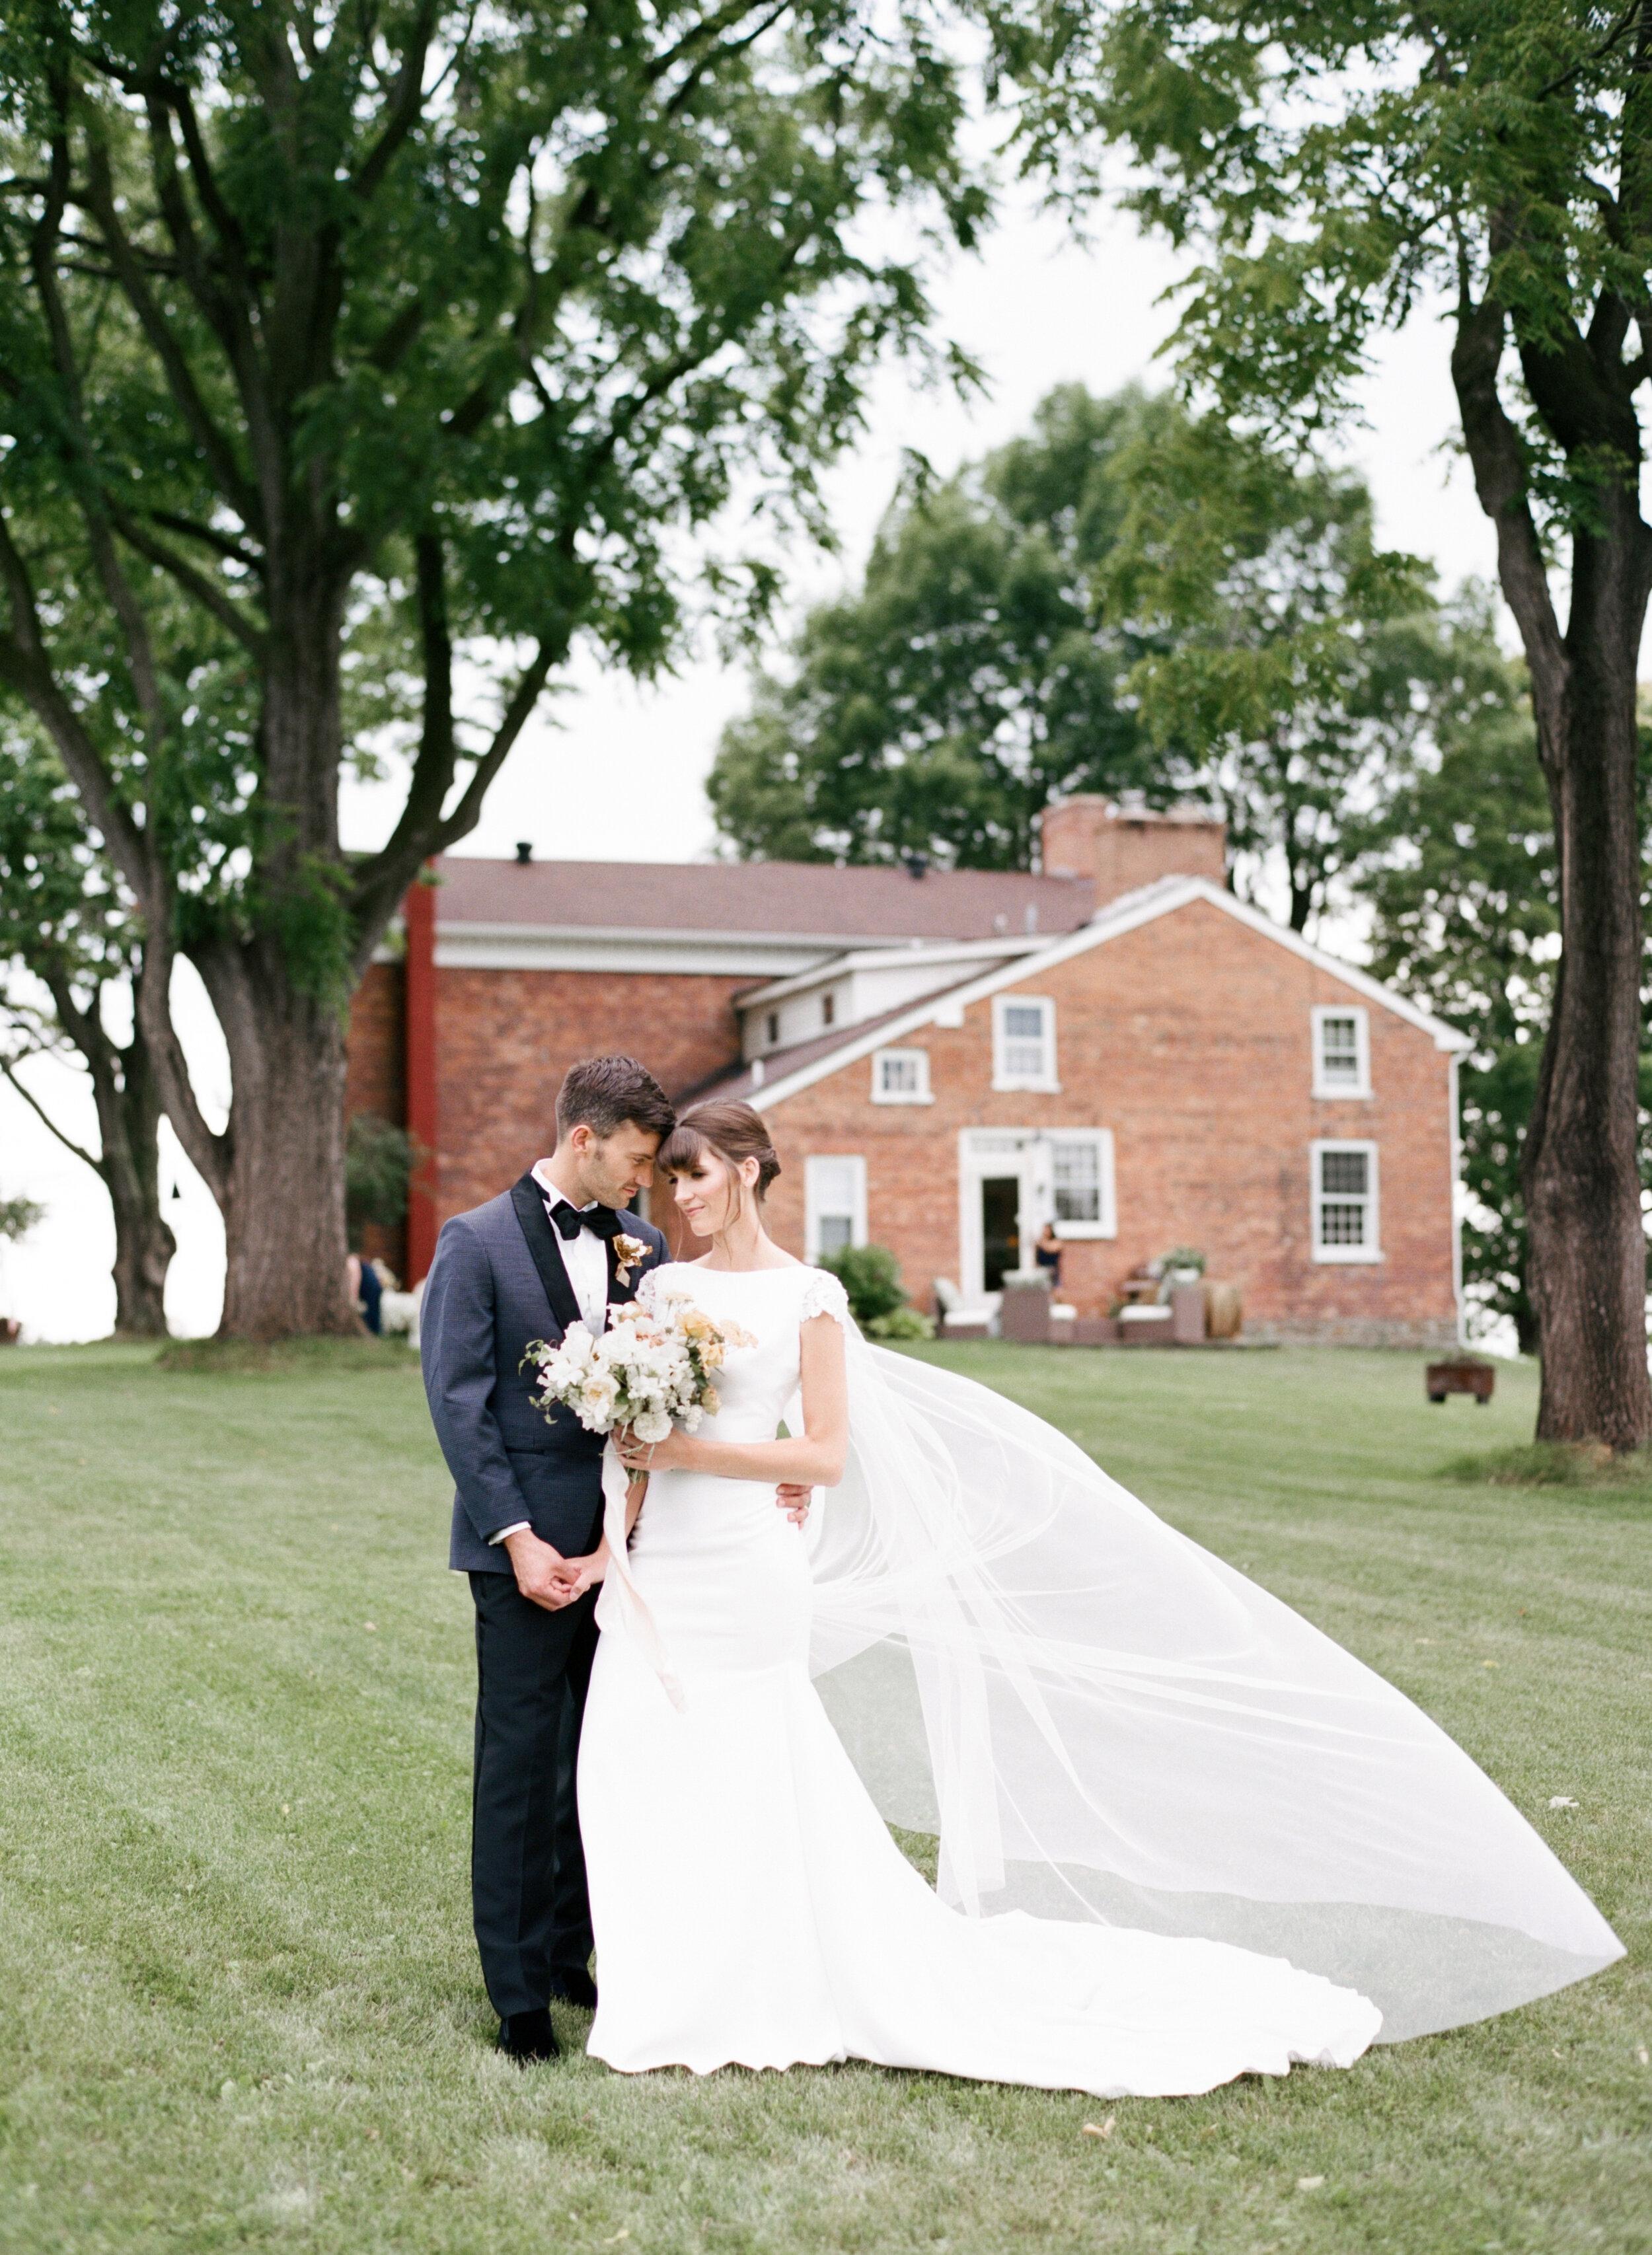 alexandra-meseke-understated-soft-luxury-wedding-upstate-ny_0052.jpg